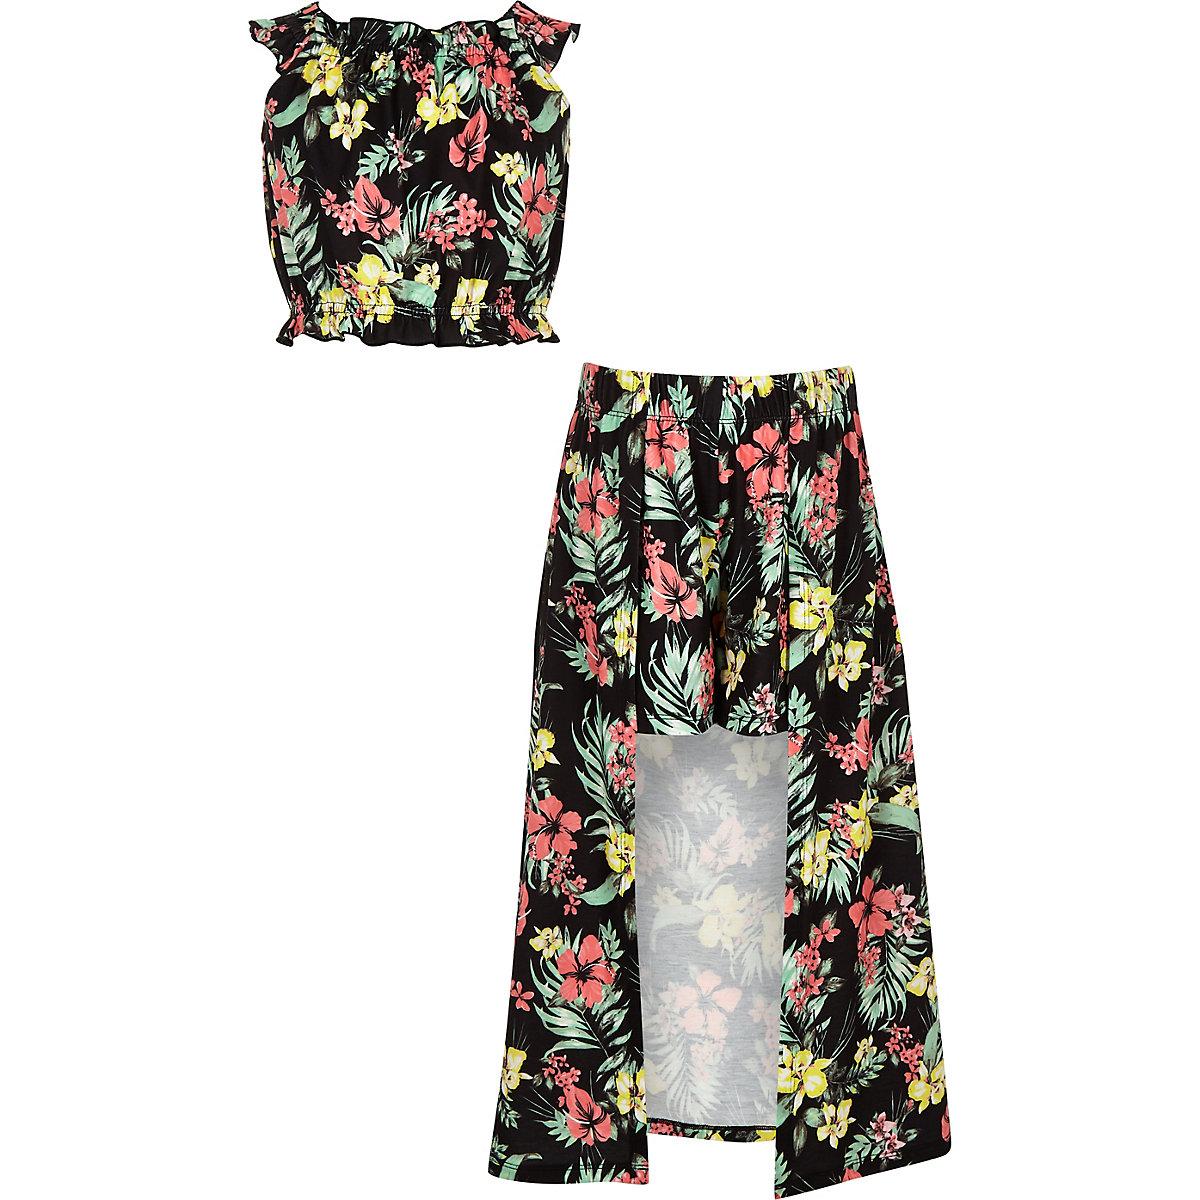 Girls black tropical print skort outfit